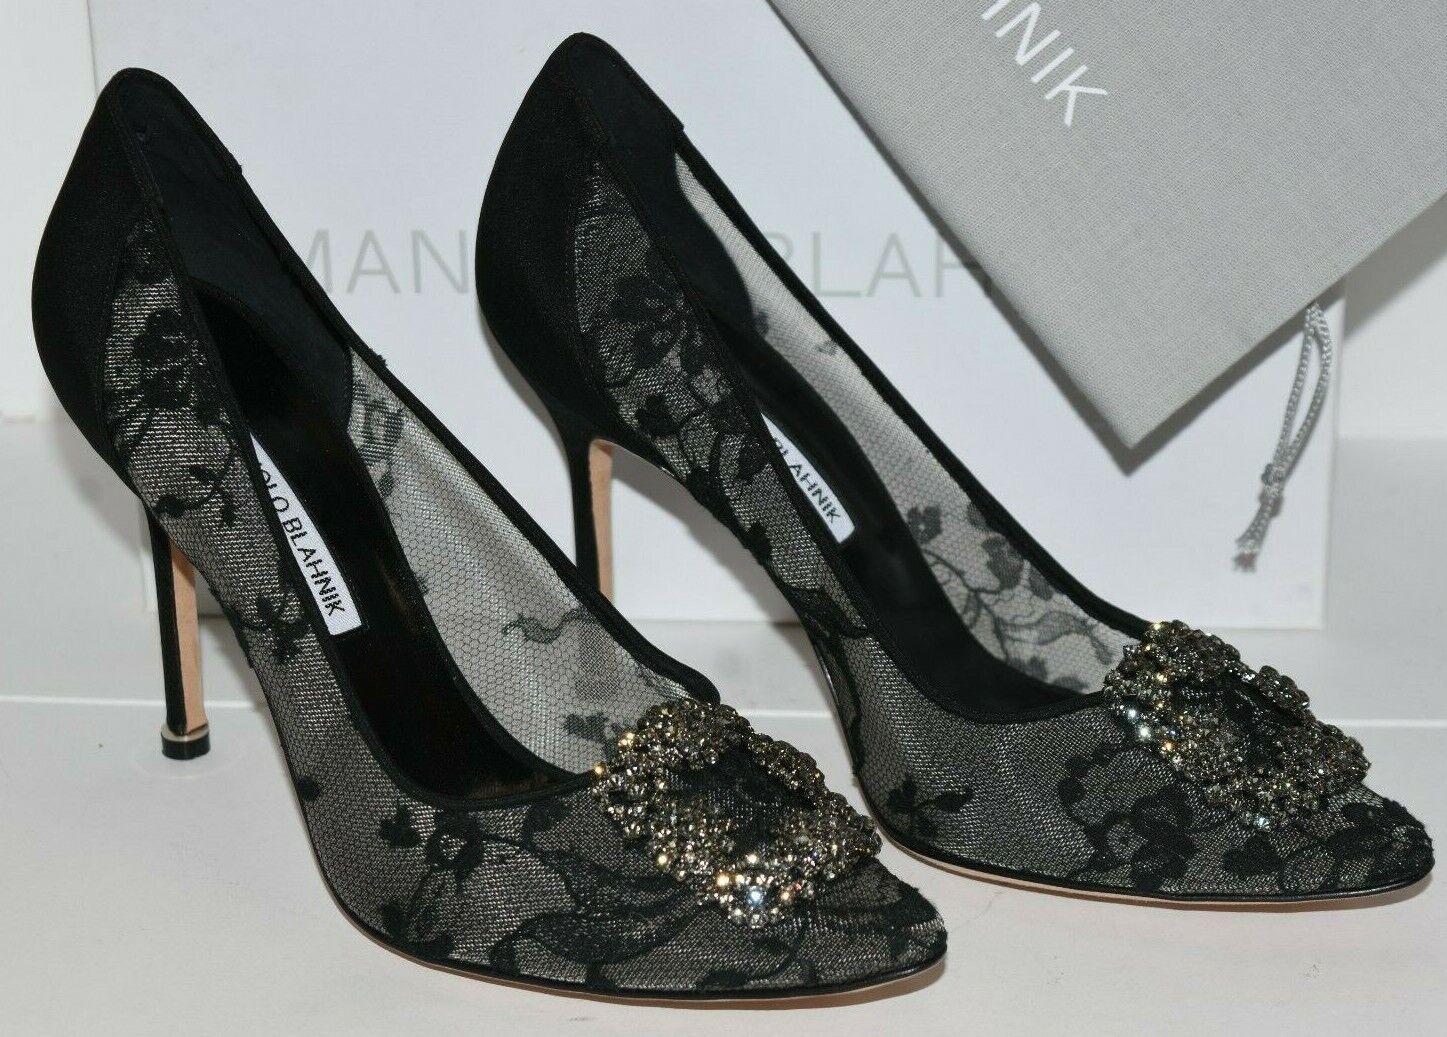 1055 NEW Manolo Blahnik HANGISI 105 LACE Black Jeweled Pumps Buckle Heels 40